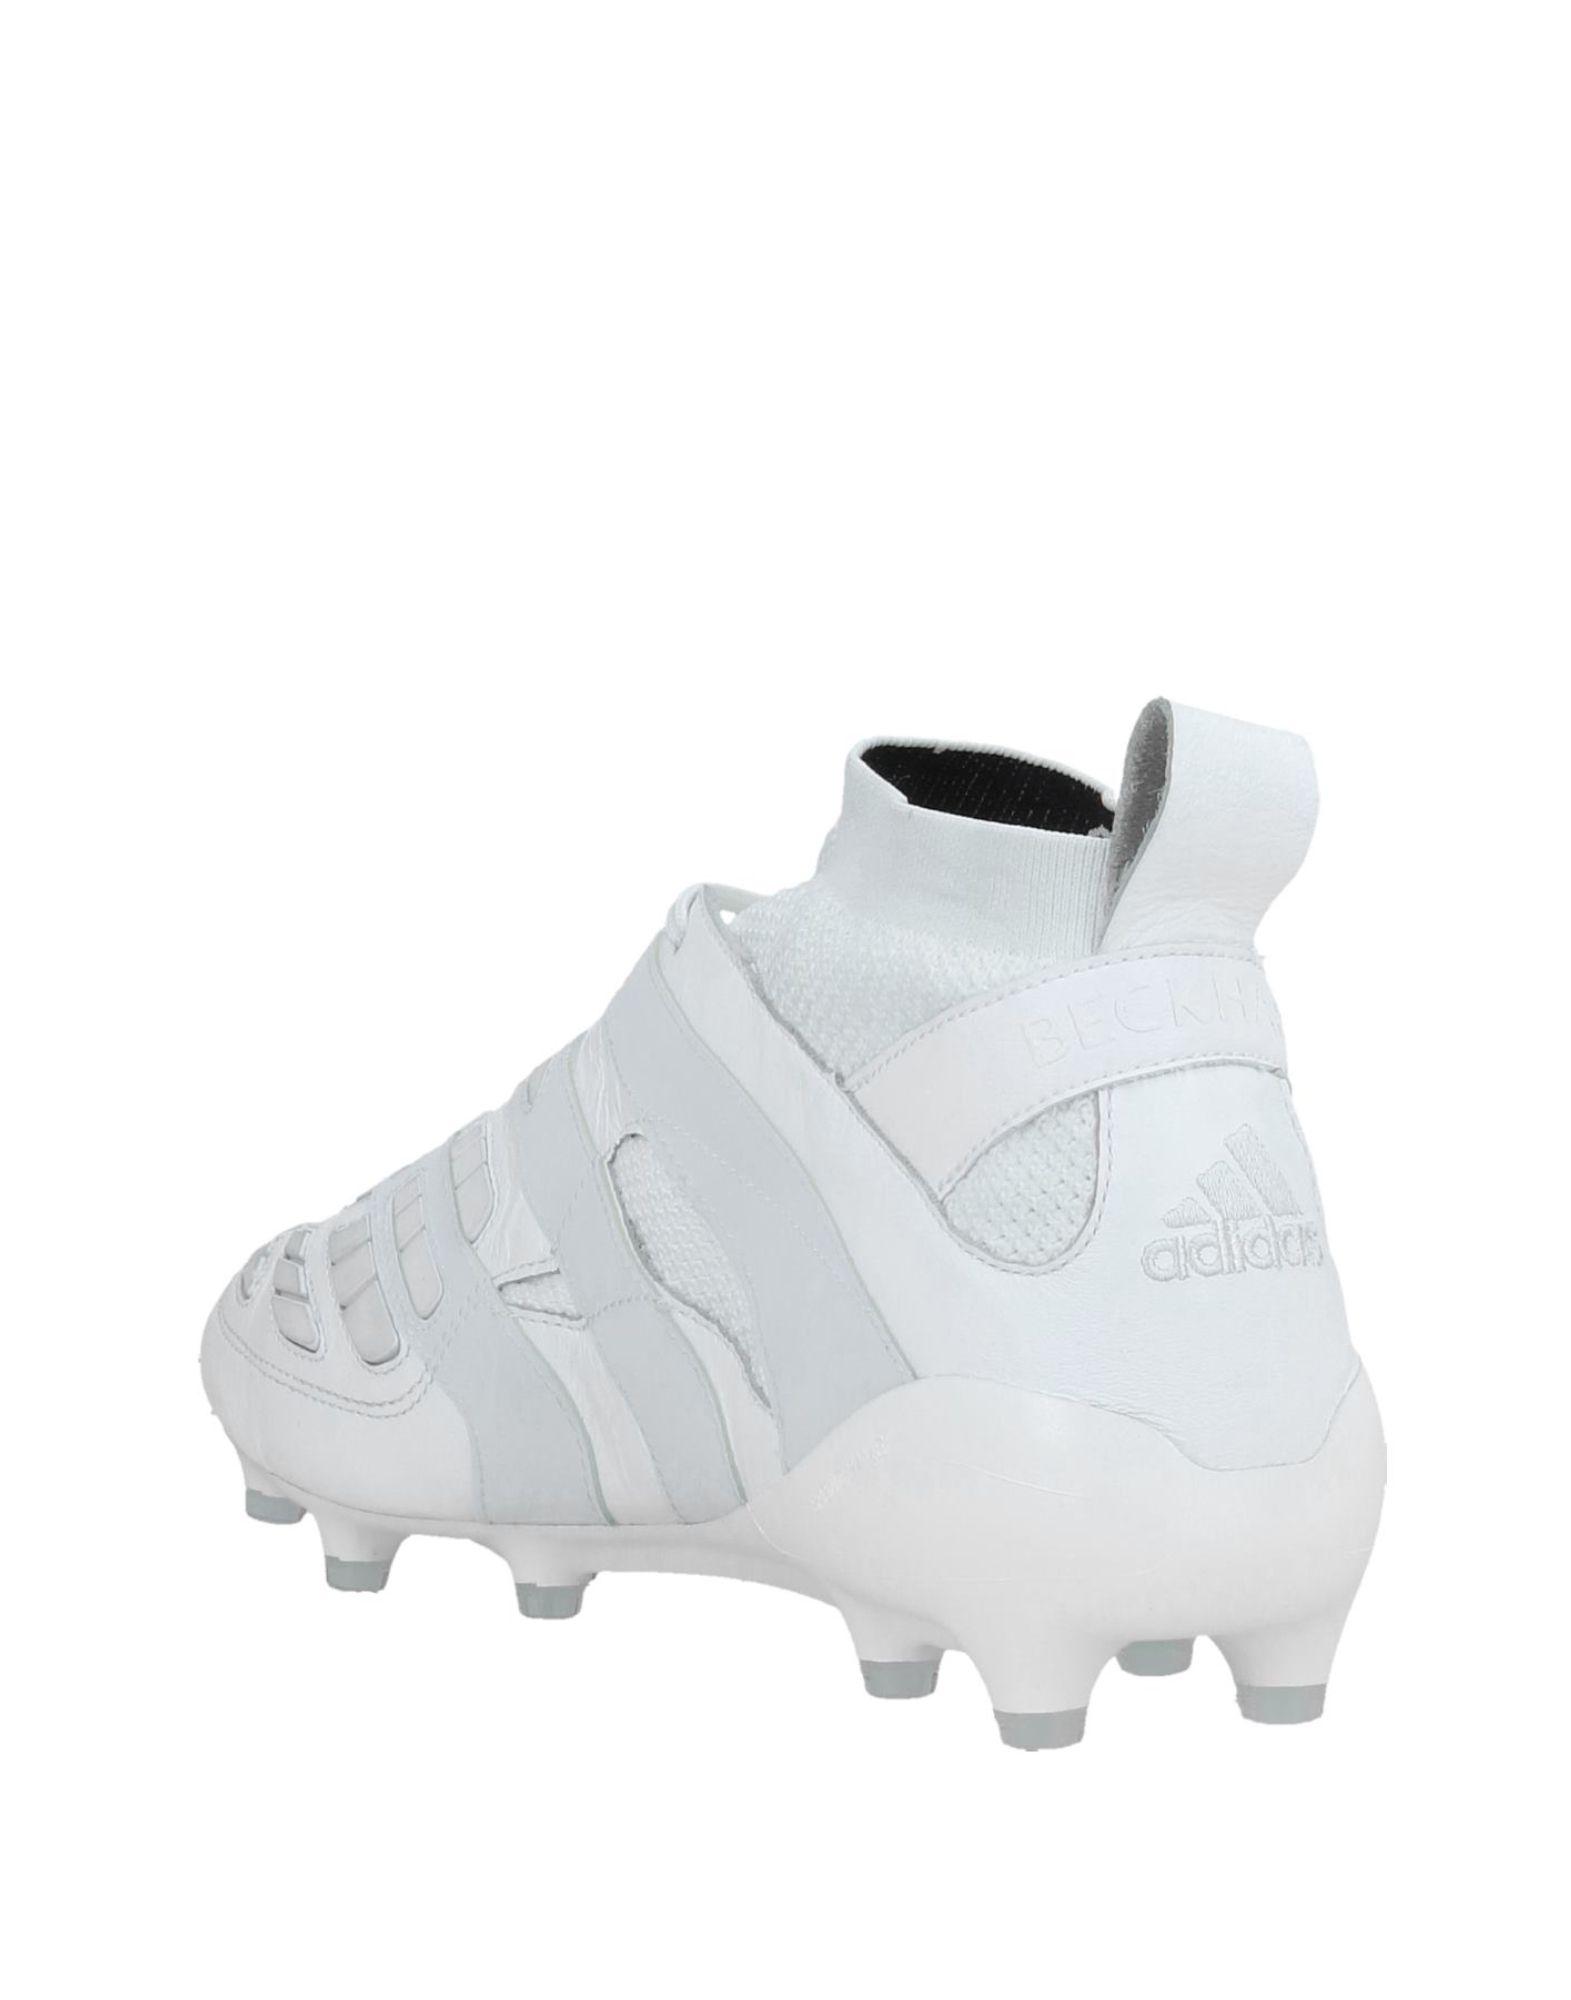 David Beckham For Adidas Sneakers Herren beliebte  11559934UK Gute Qualität beliebte Herren Schuhe 4acf54